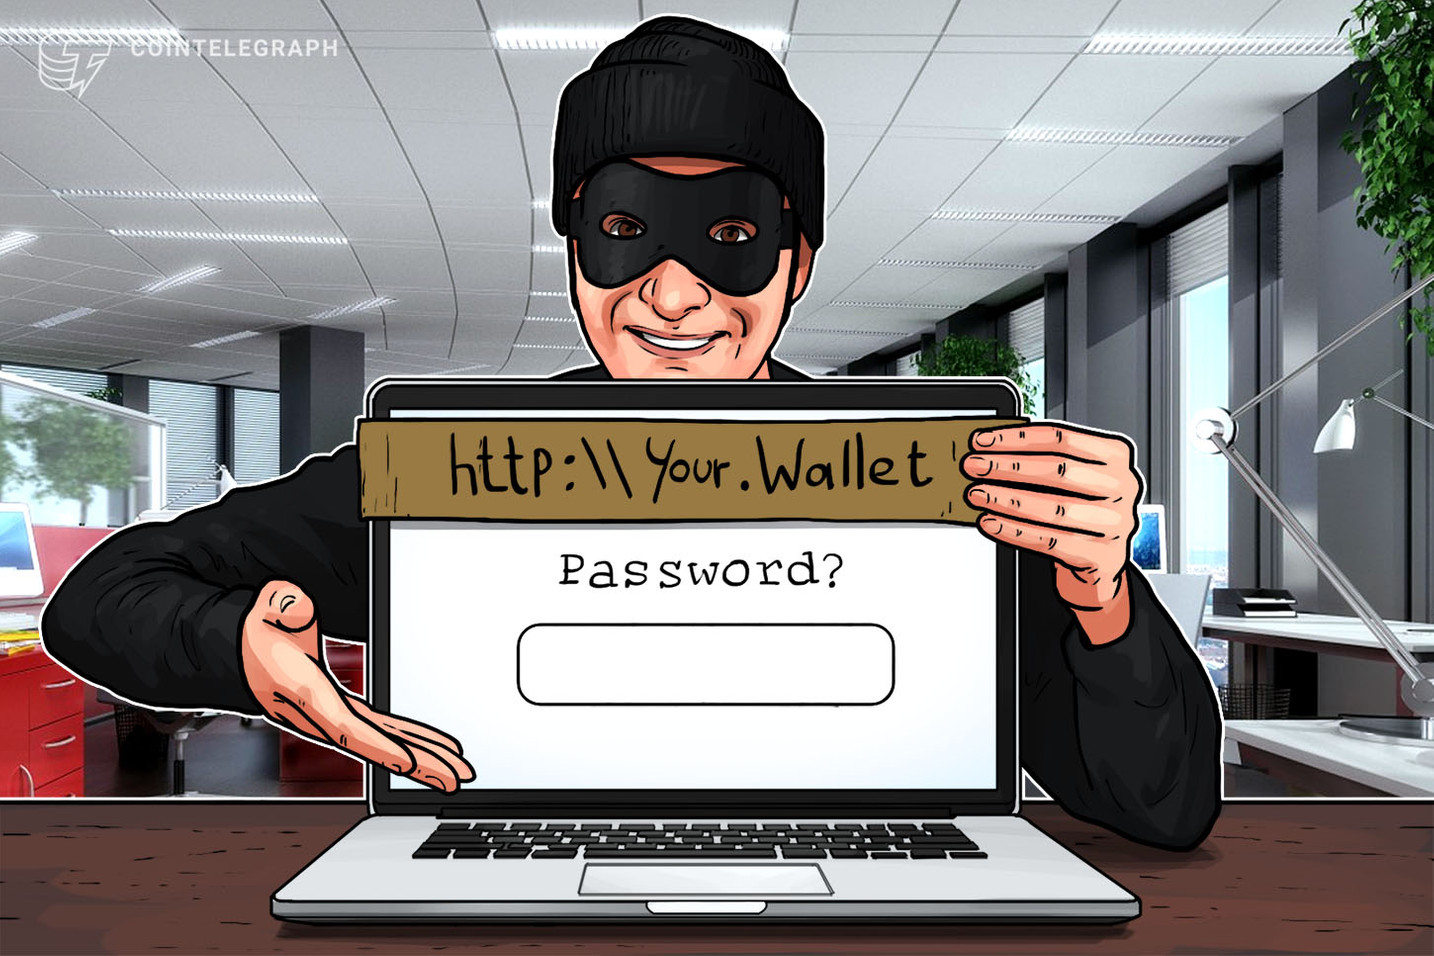 Lažni MetaMask kripto malver povučen sa Google Play prodavnice nakon dojave